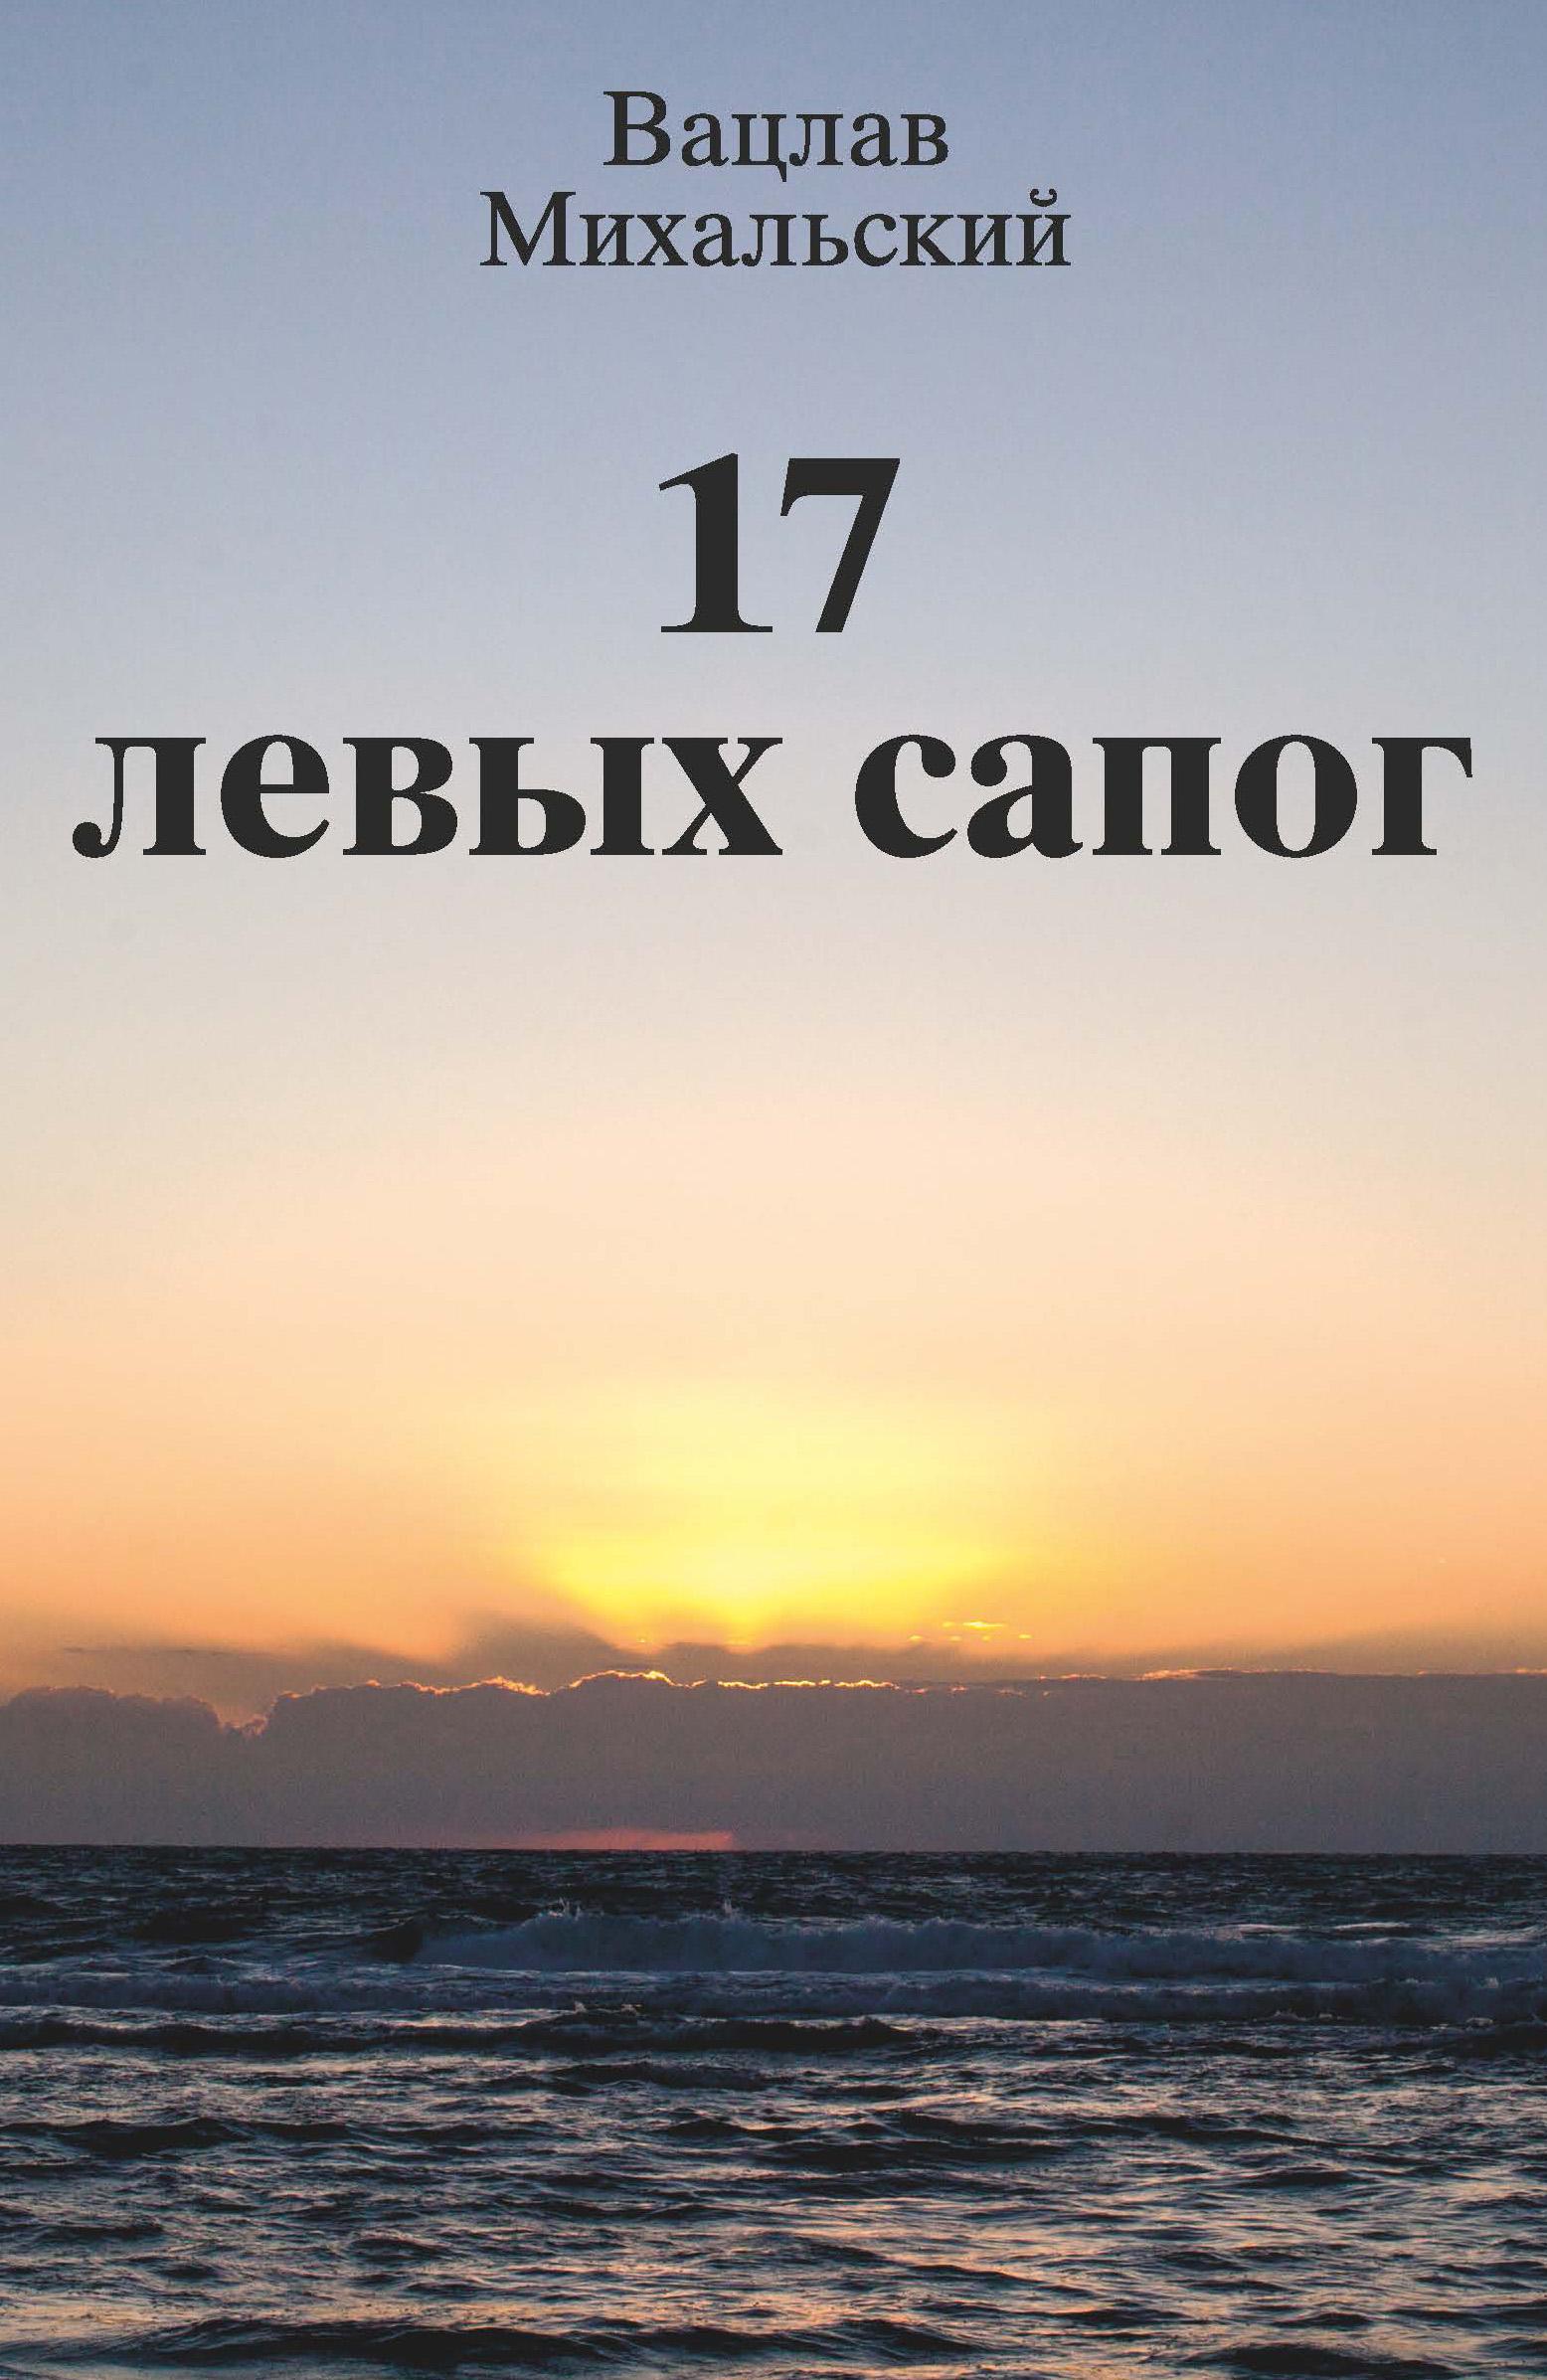 Вацлав Вацлавович Михальский 17 левых сапог вацлав михальский вацлав михальский избранное